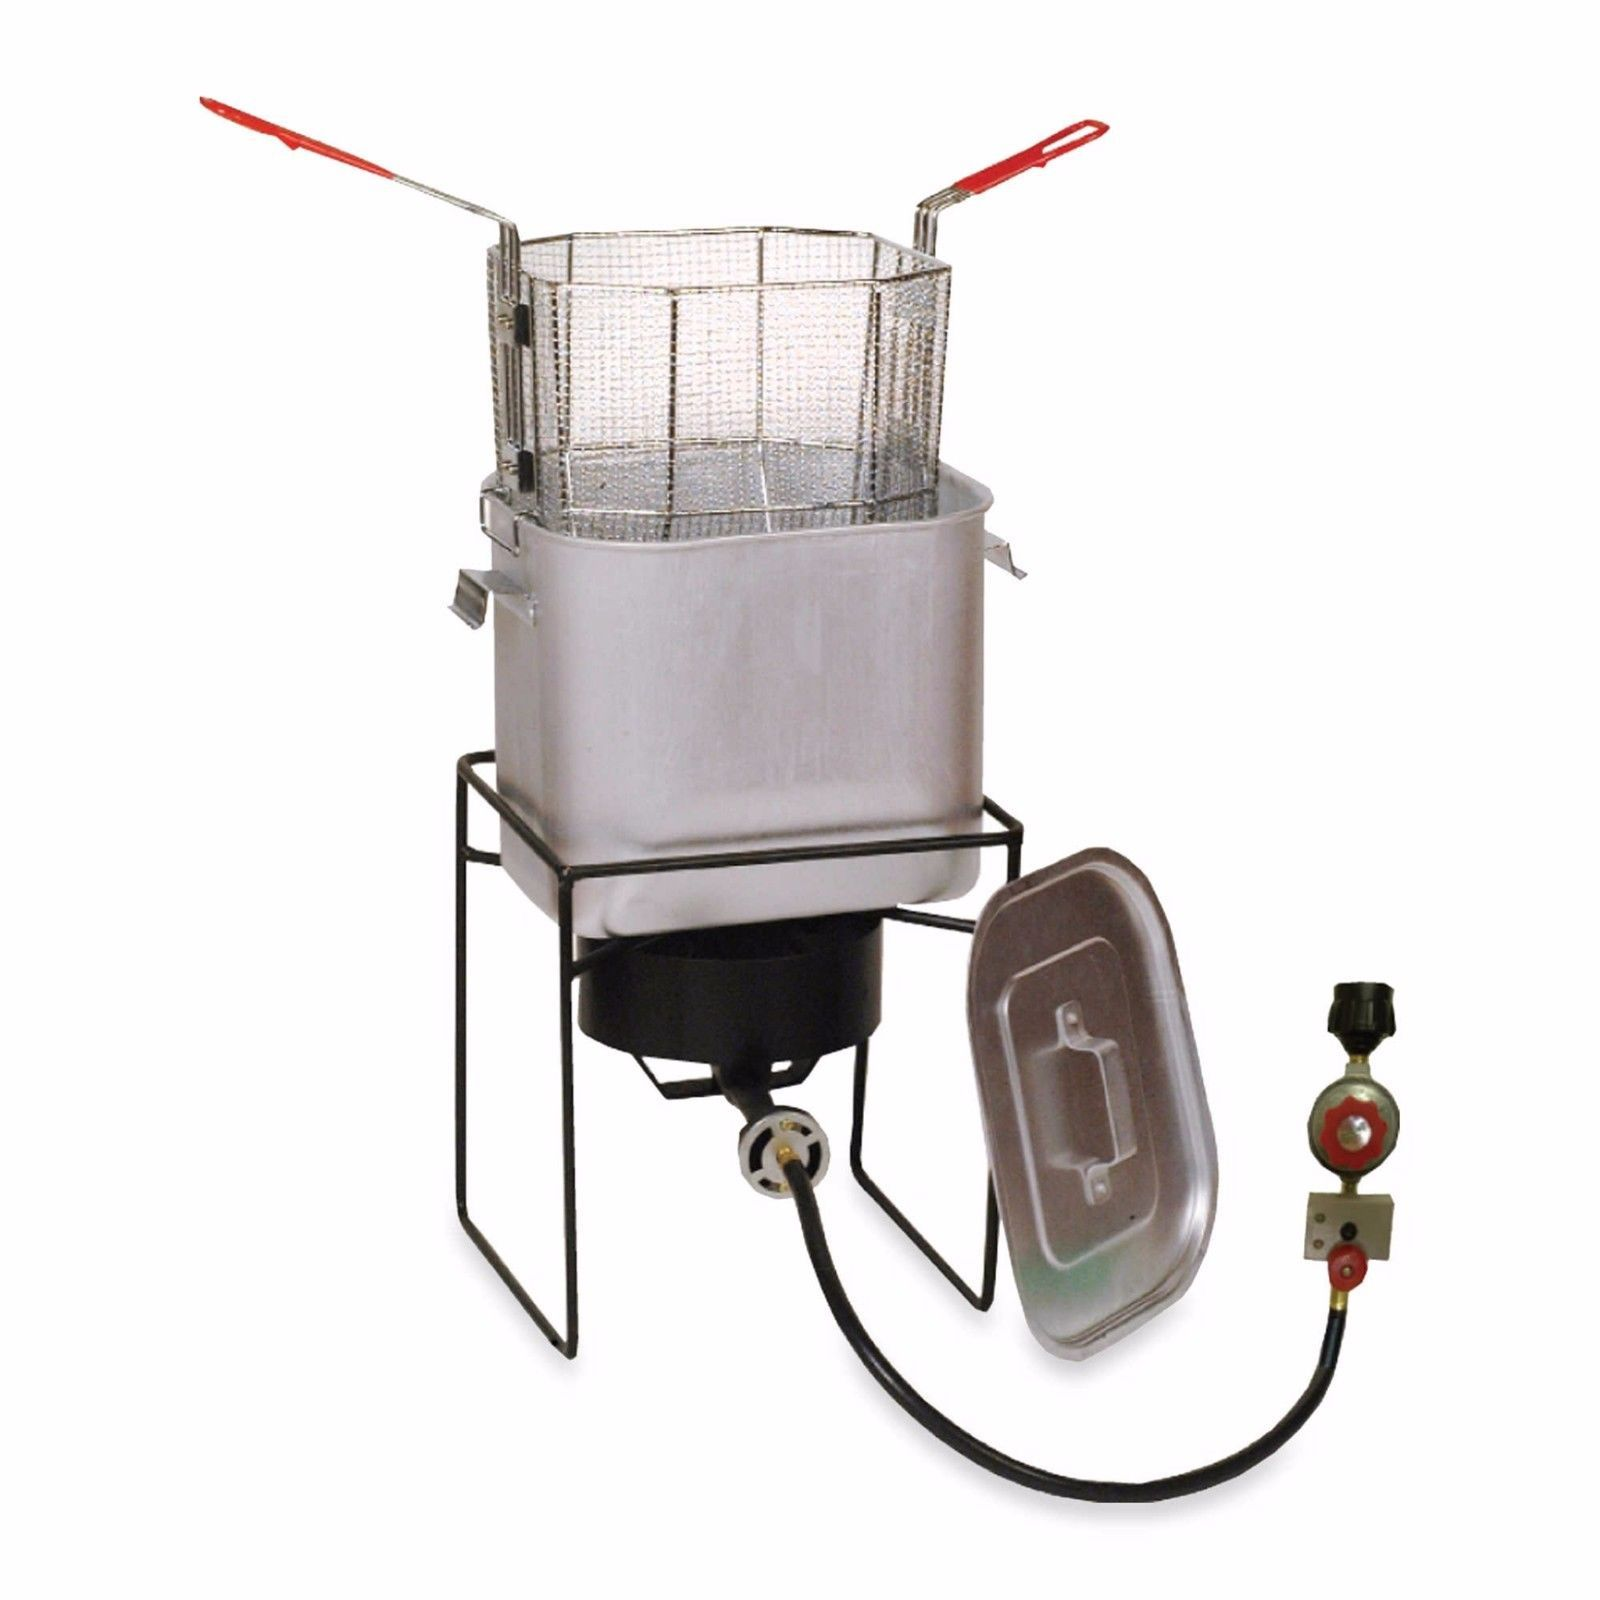 outdoor turkey chicken poultry deep fryer boiler simmer cooking pot bucket sta - Outdoor Deep Fryer